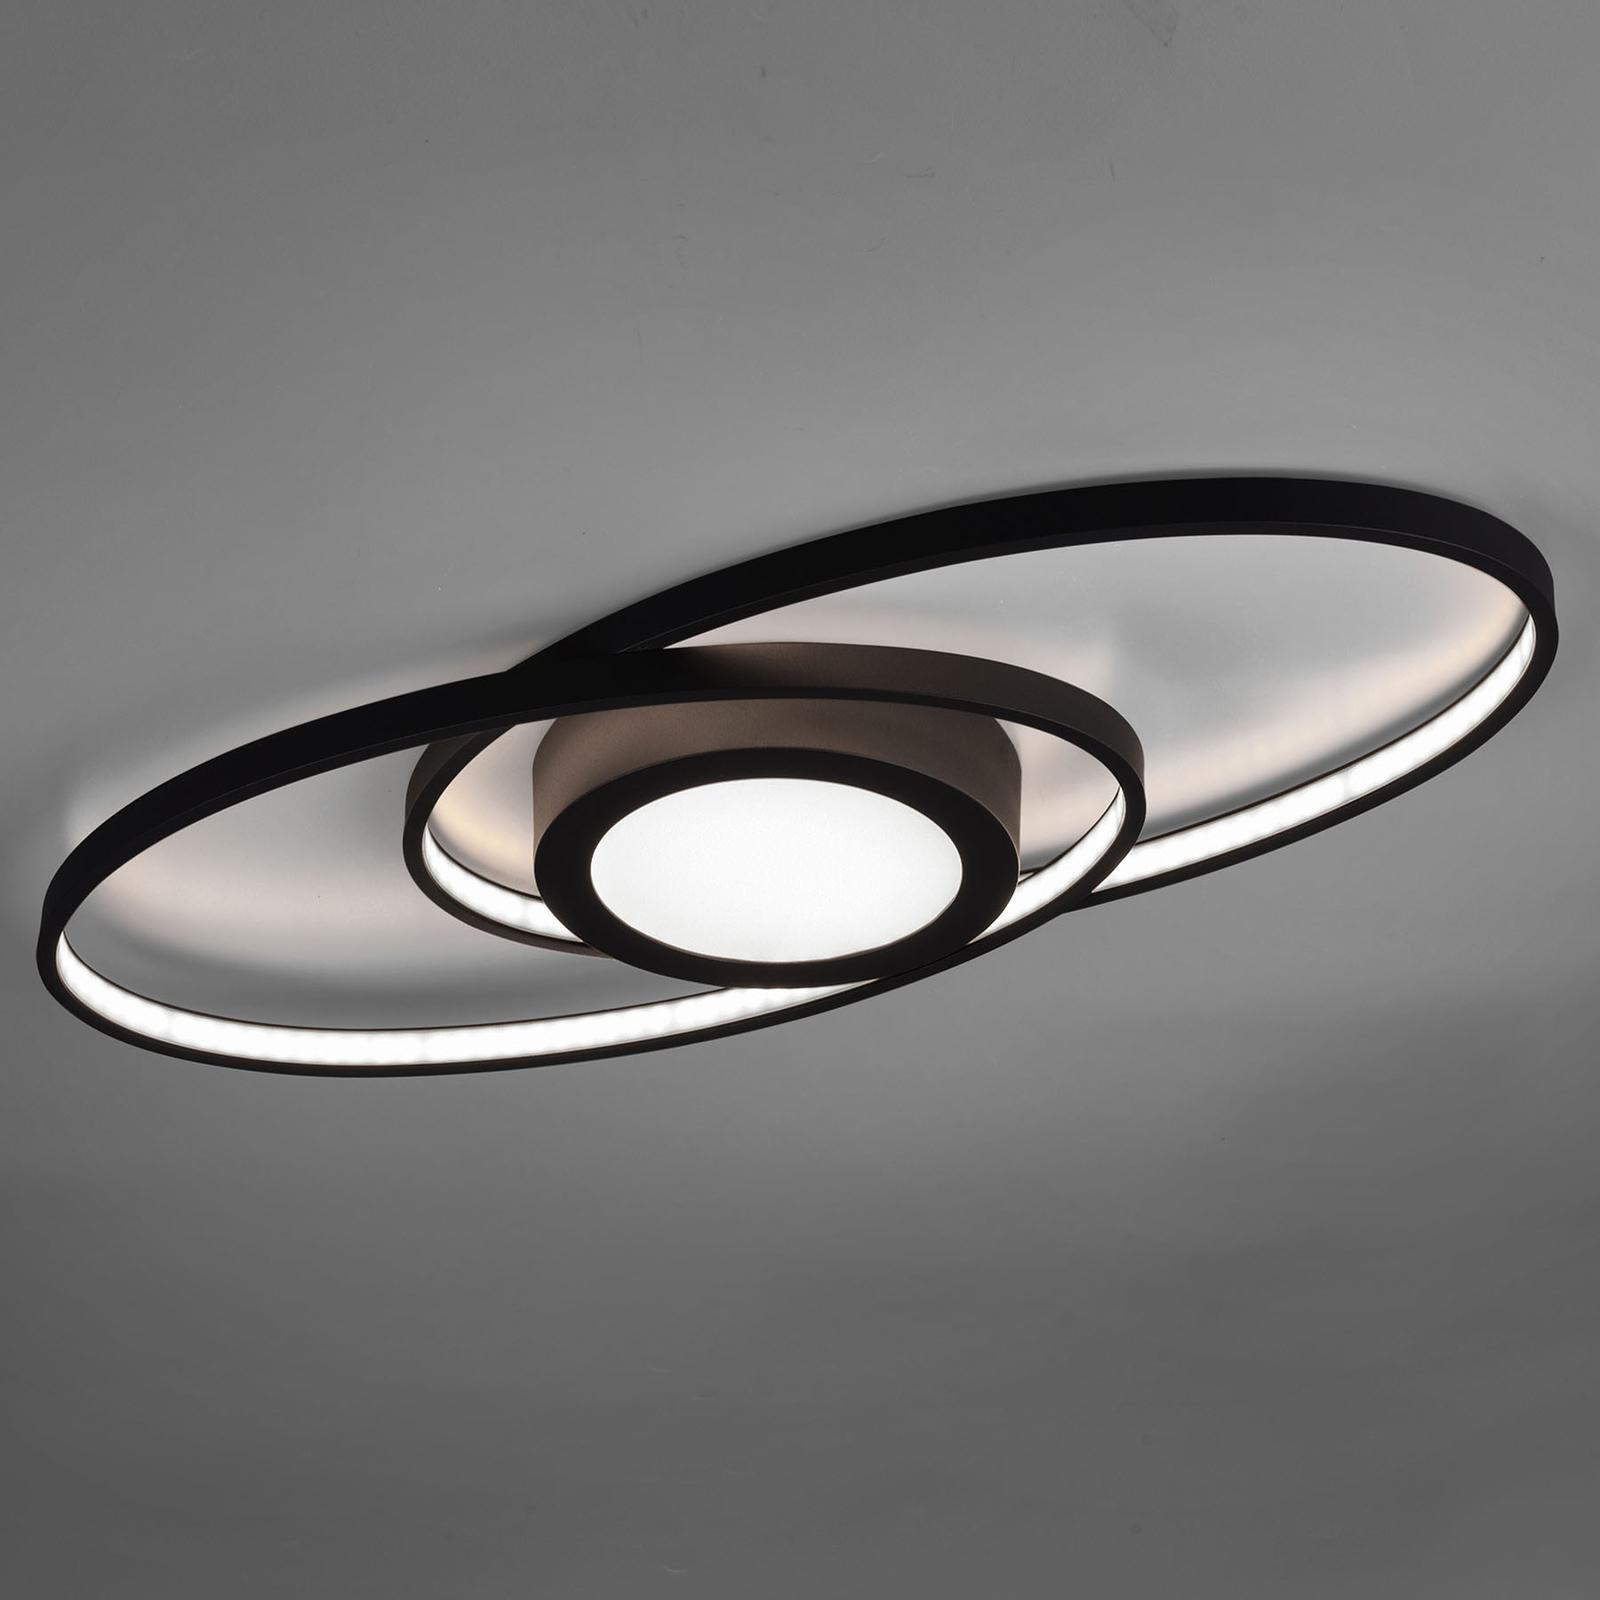 Galaxy LED-loftlampe, kan dæmpes, antracit